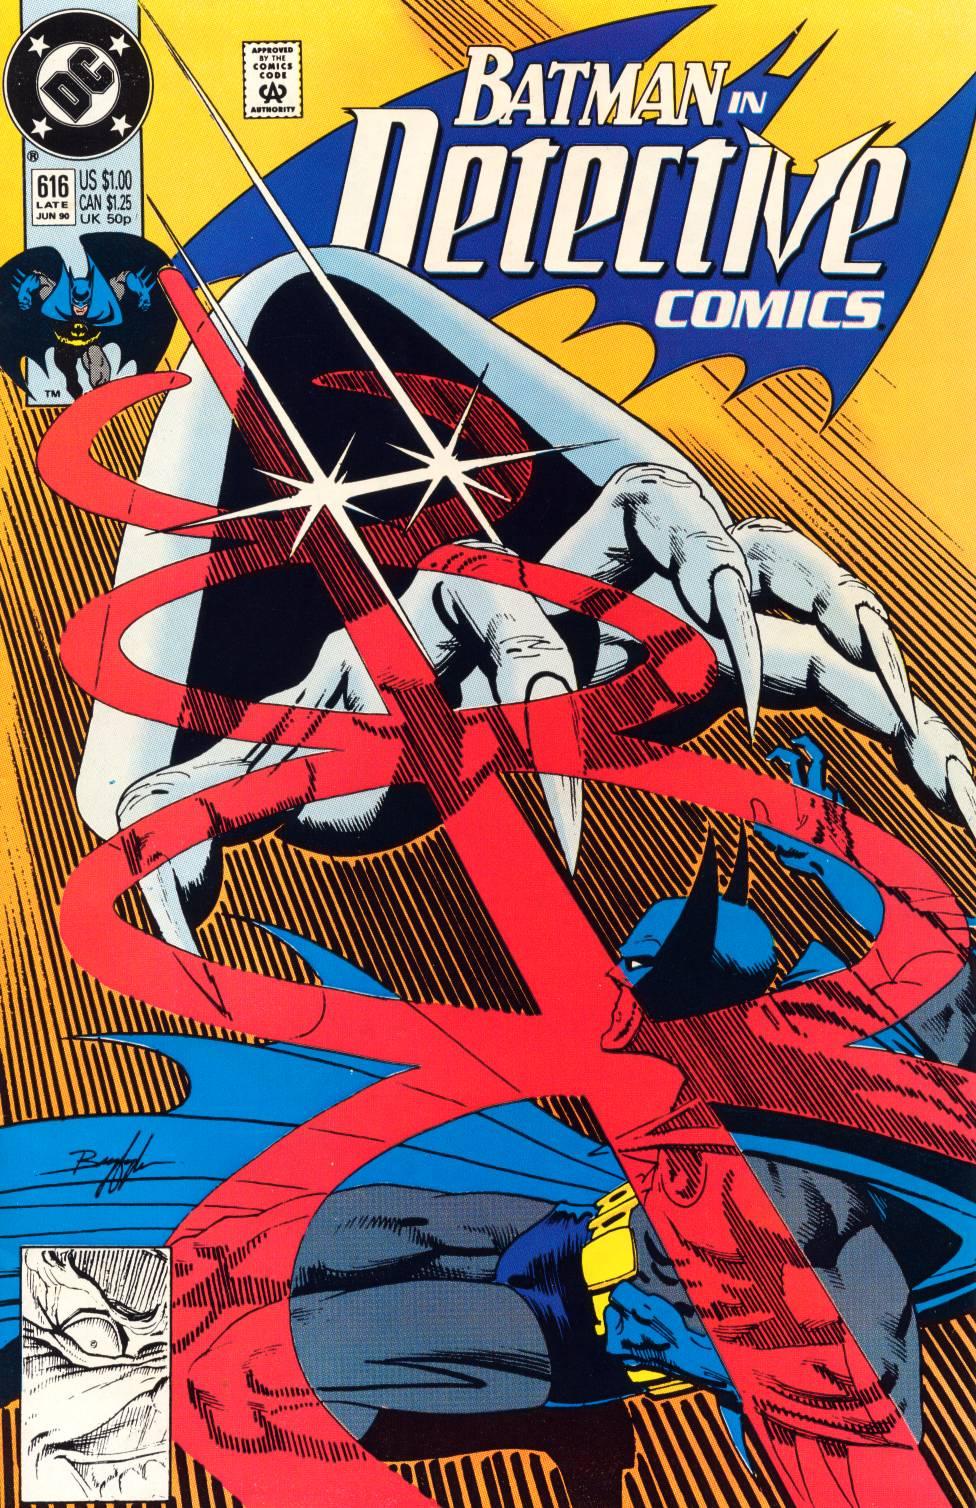 Detective Comics (1937) 616 Page 1